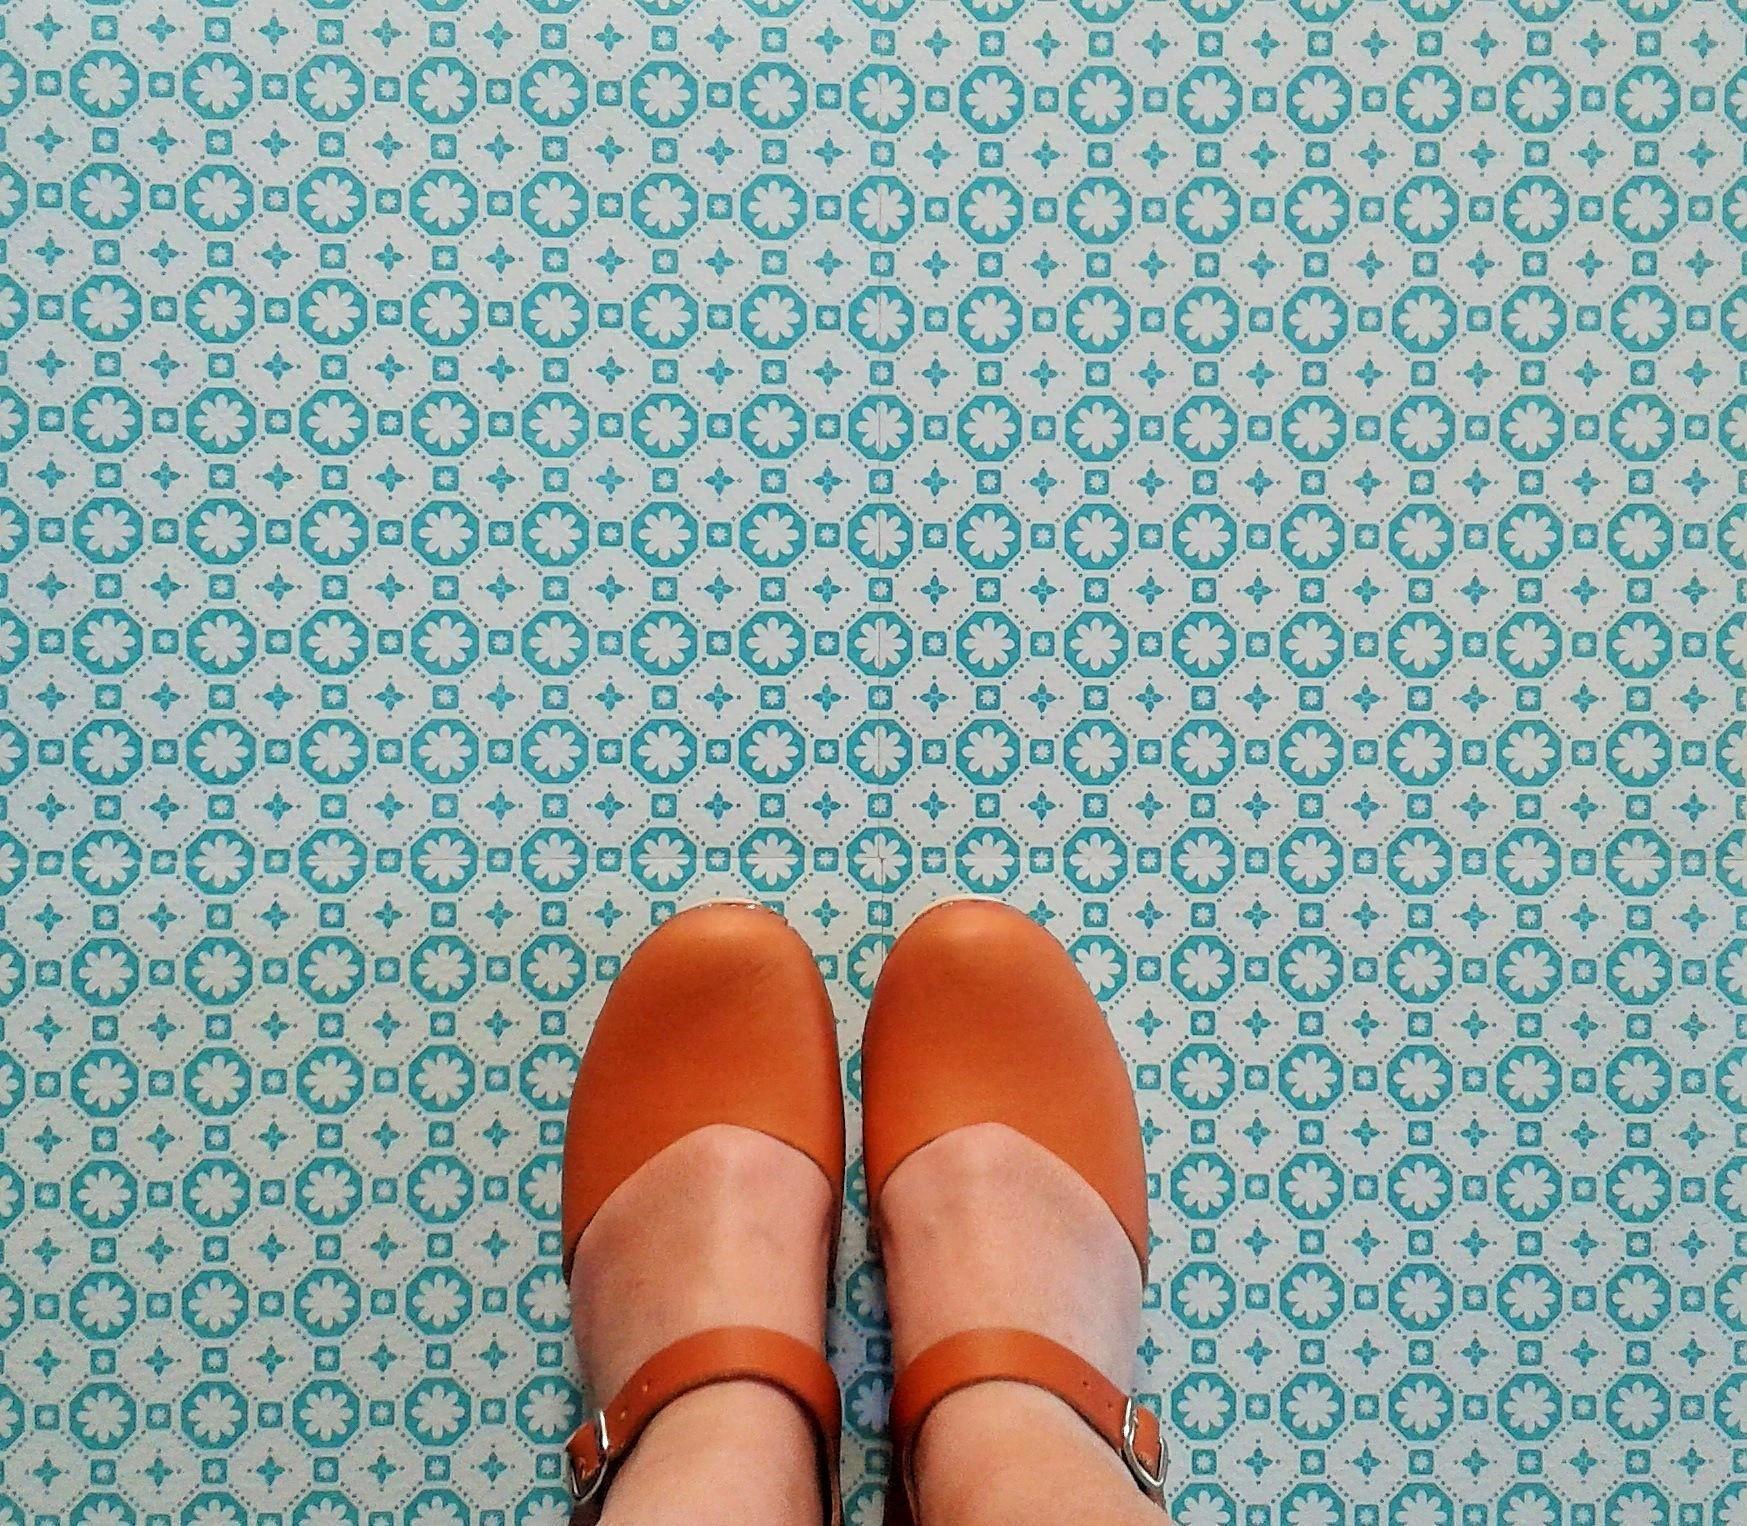 Bali Vinyl Floor Tiles | Pinterest | Retro vinyl flooring, House ...